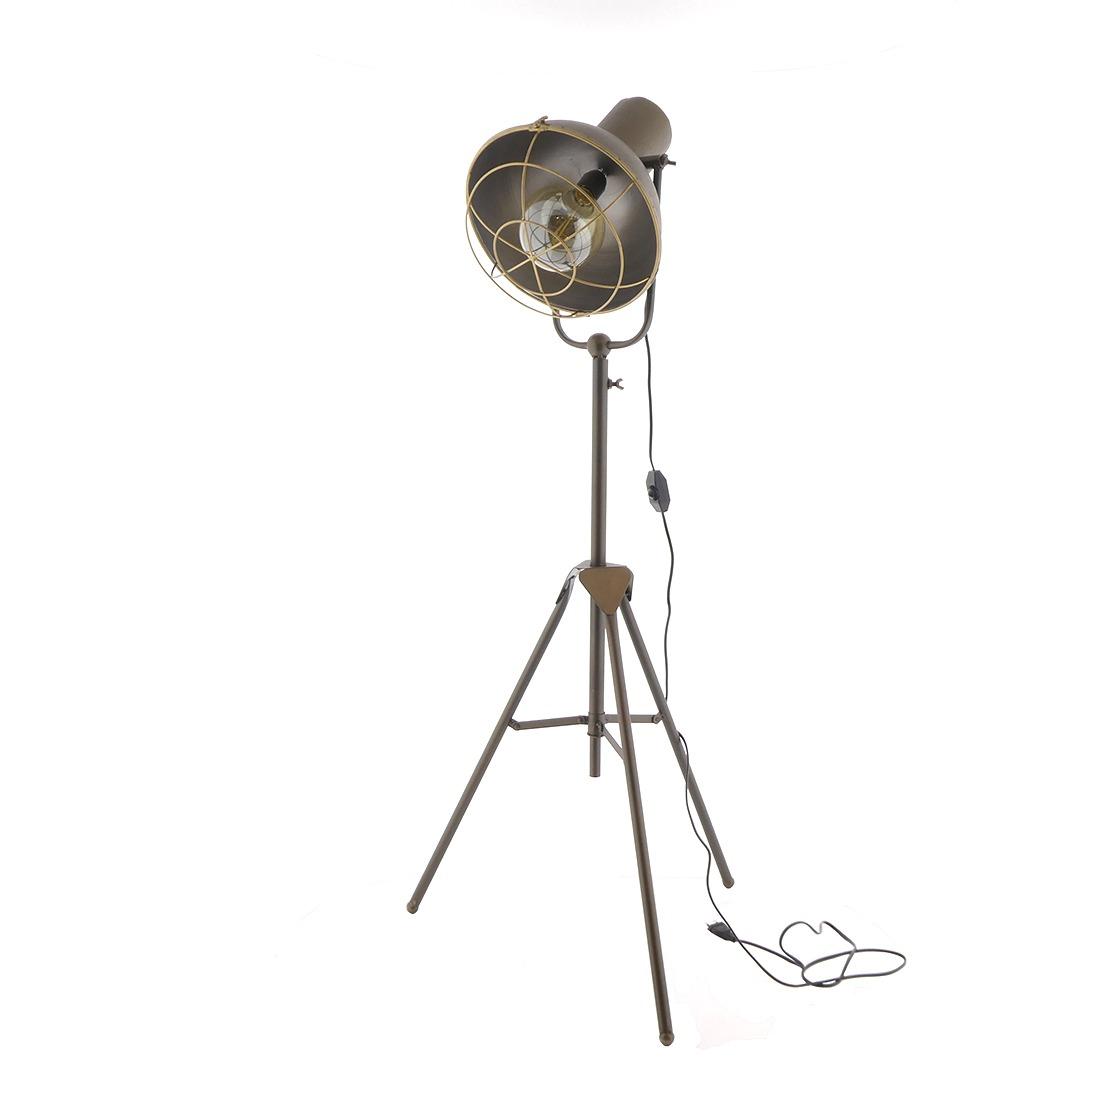 XL 1 lamp